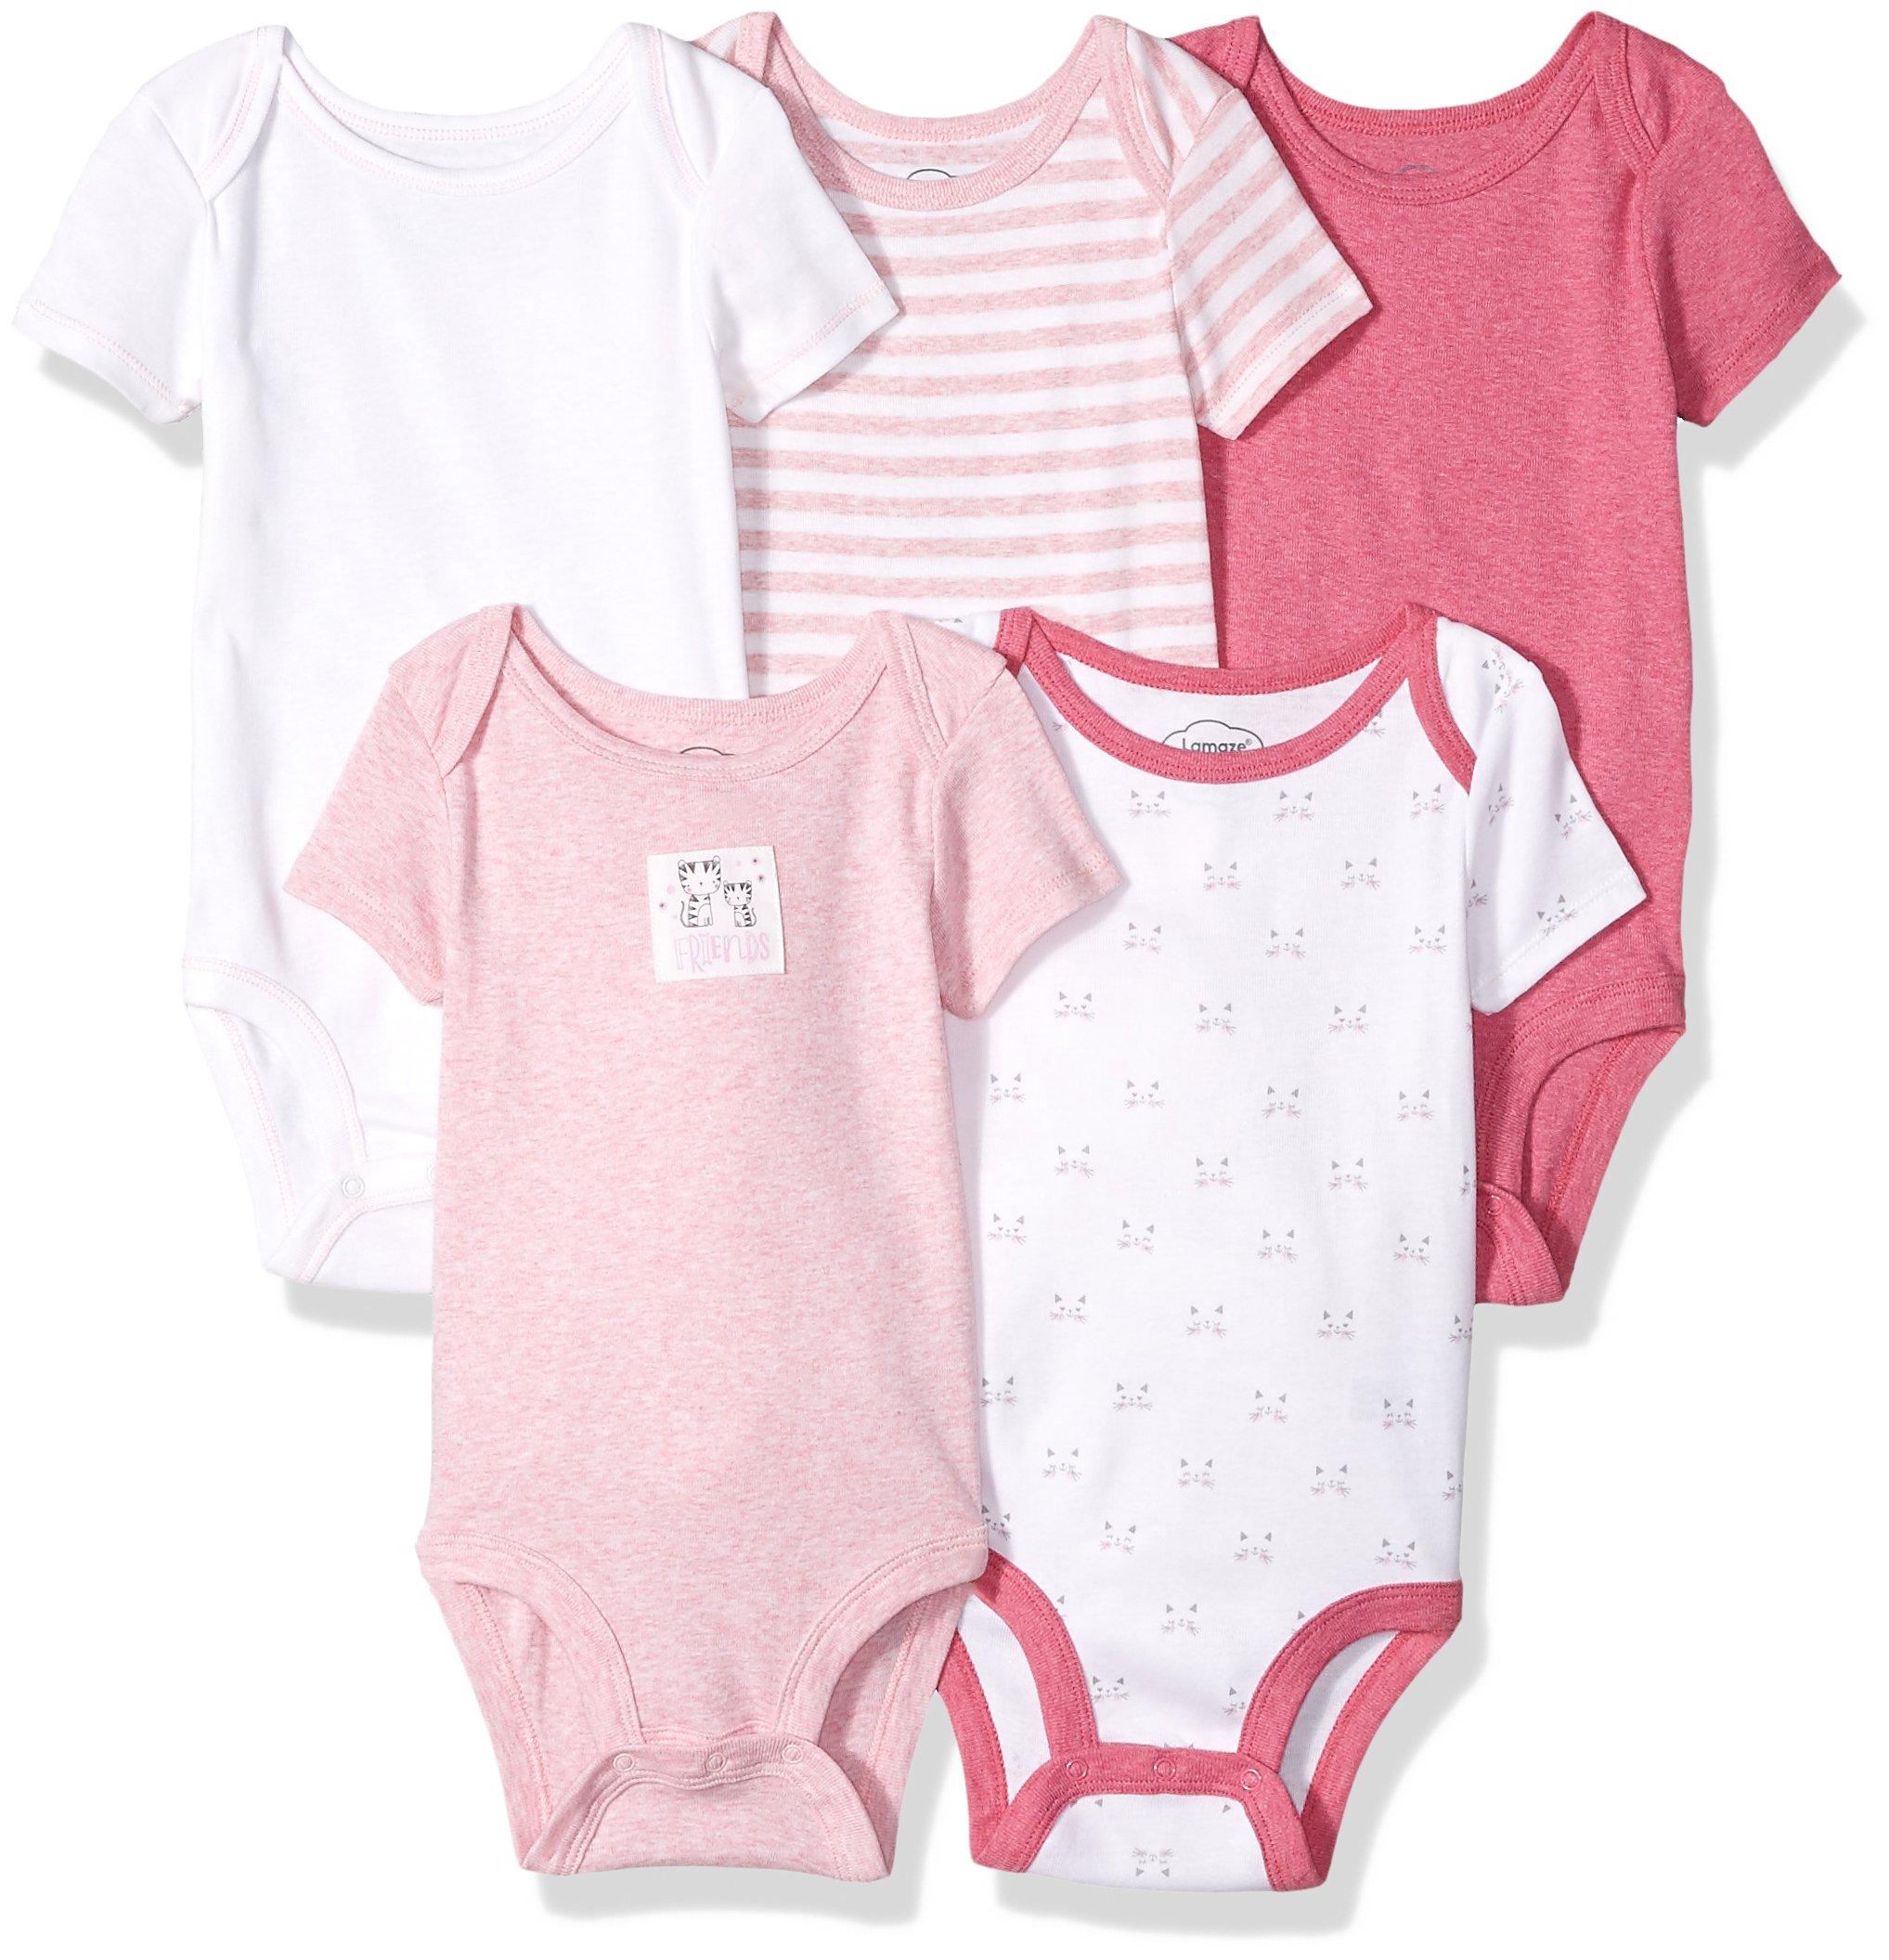 Lamaze Baby Organic Essentials 5 Pack Shortsleeve Bodysuits, Pink, 3M